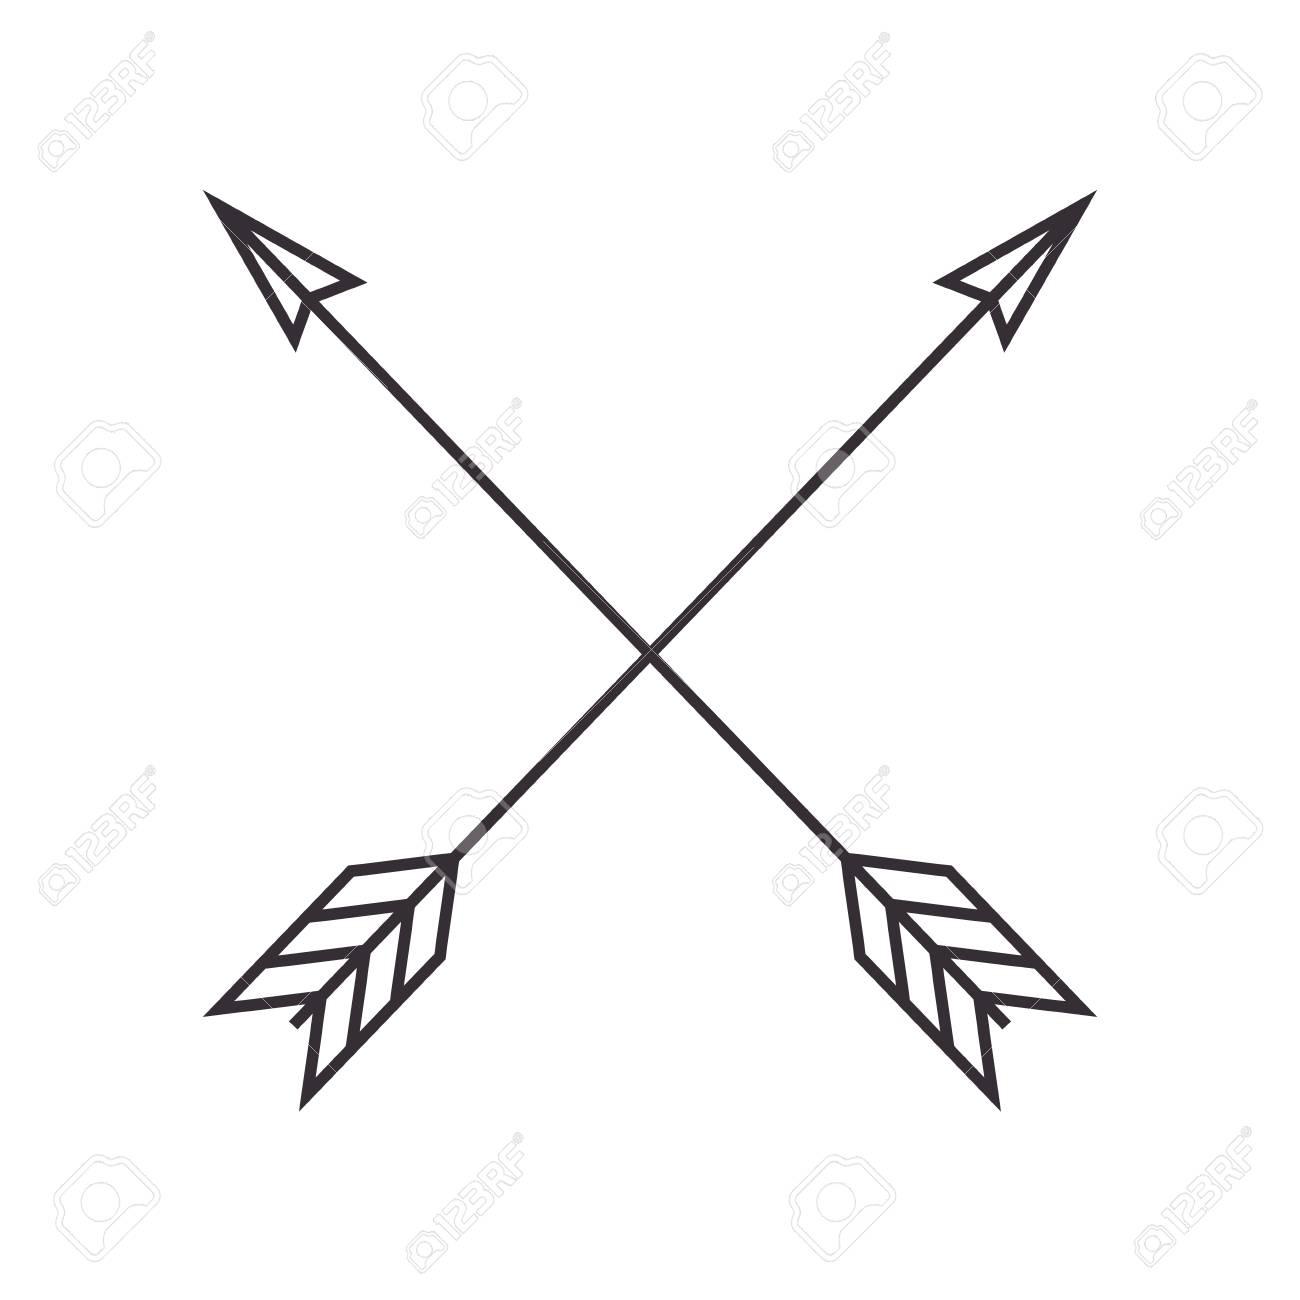 arrows crossed frame icon vector illustration design.